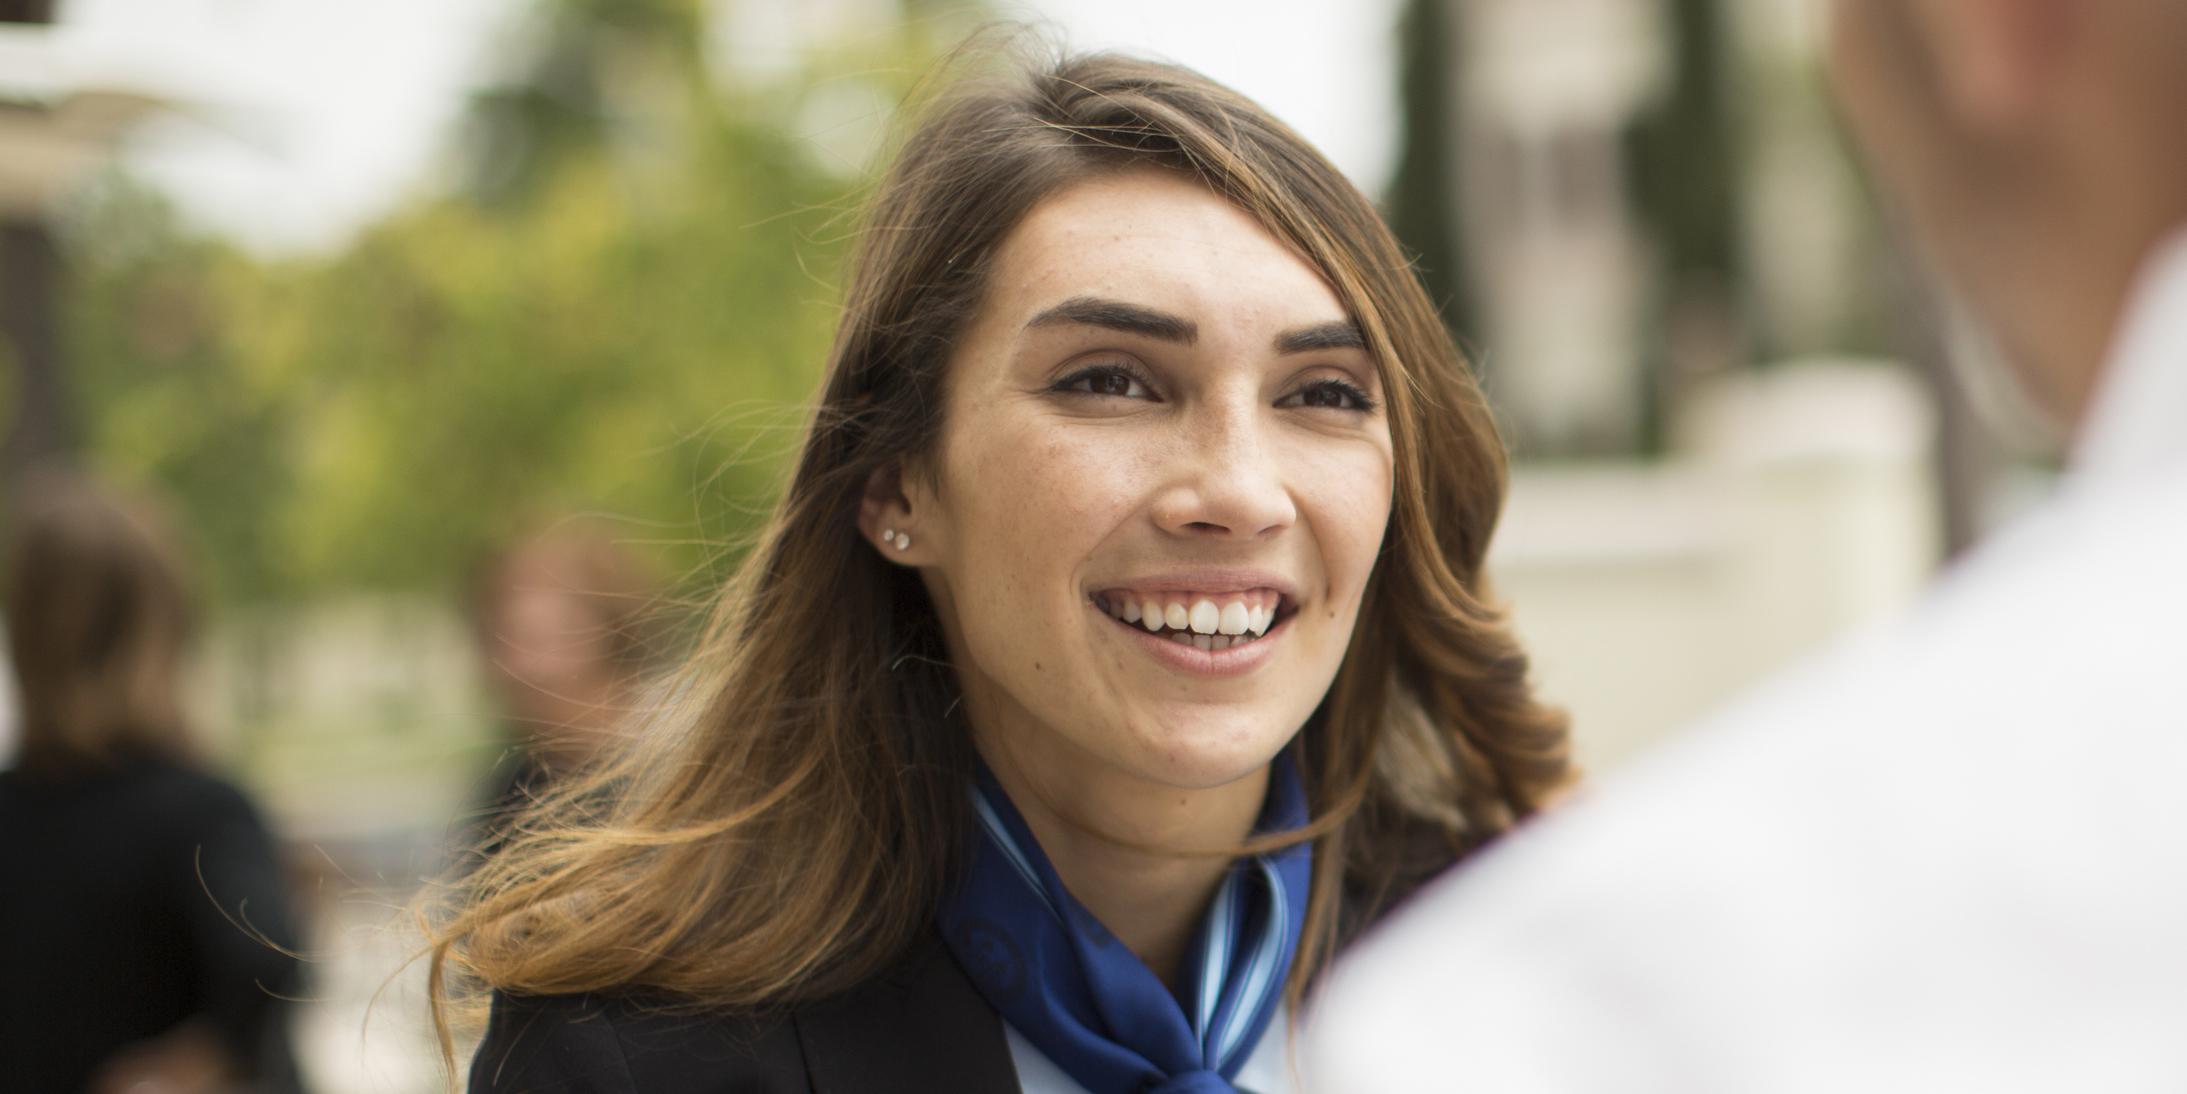 Olivia Gonzalez '17, USD's President for a Day